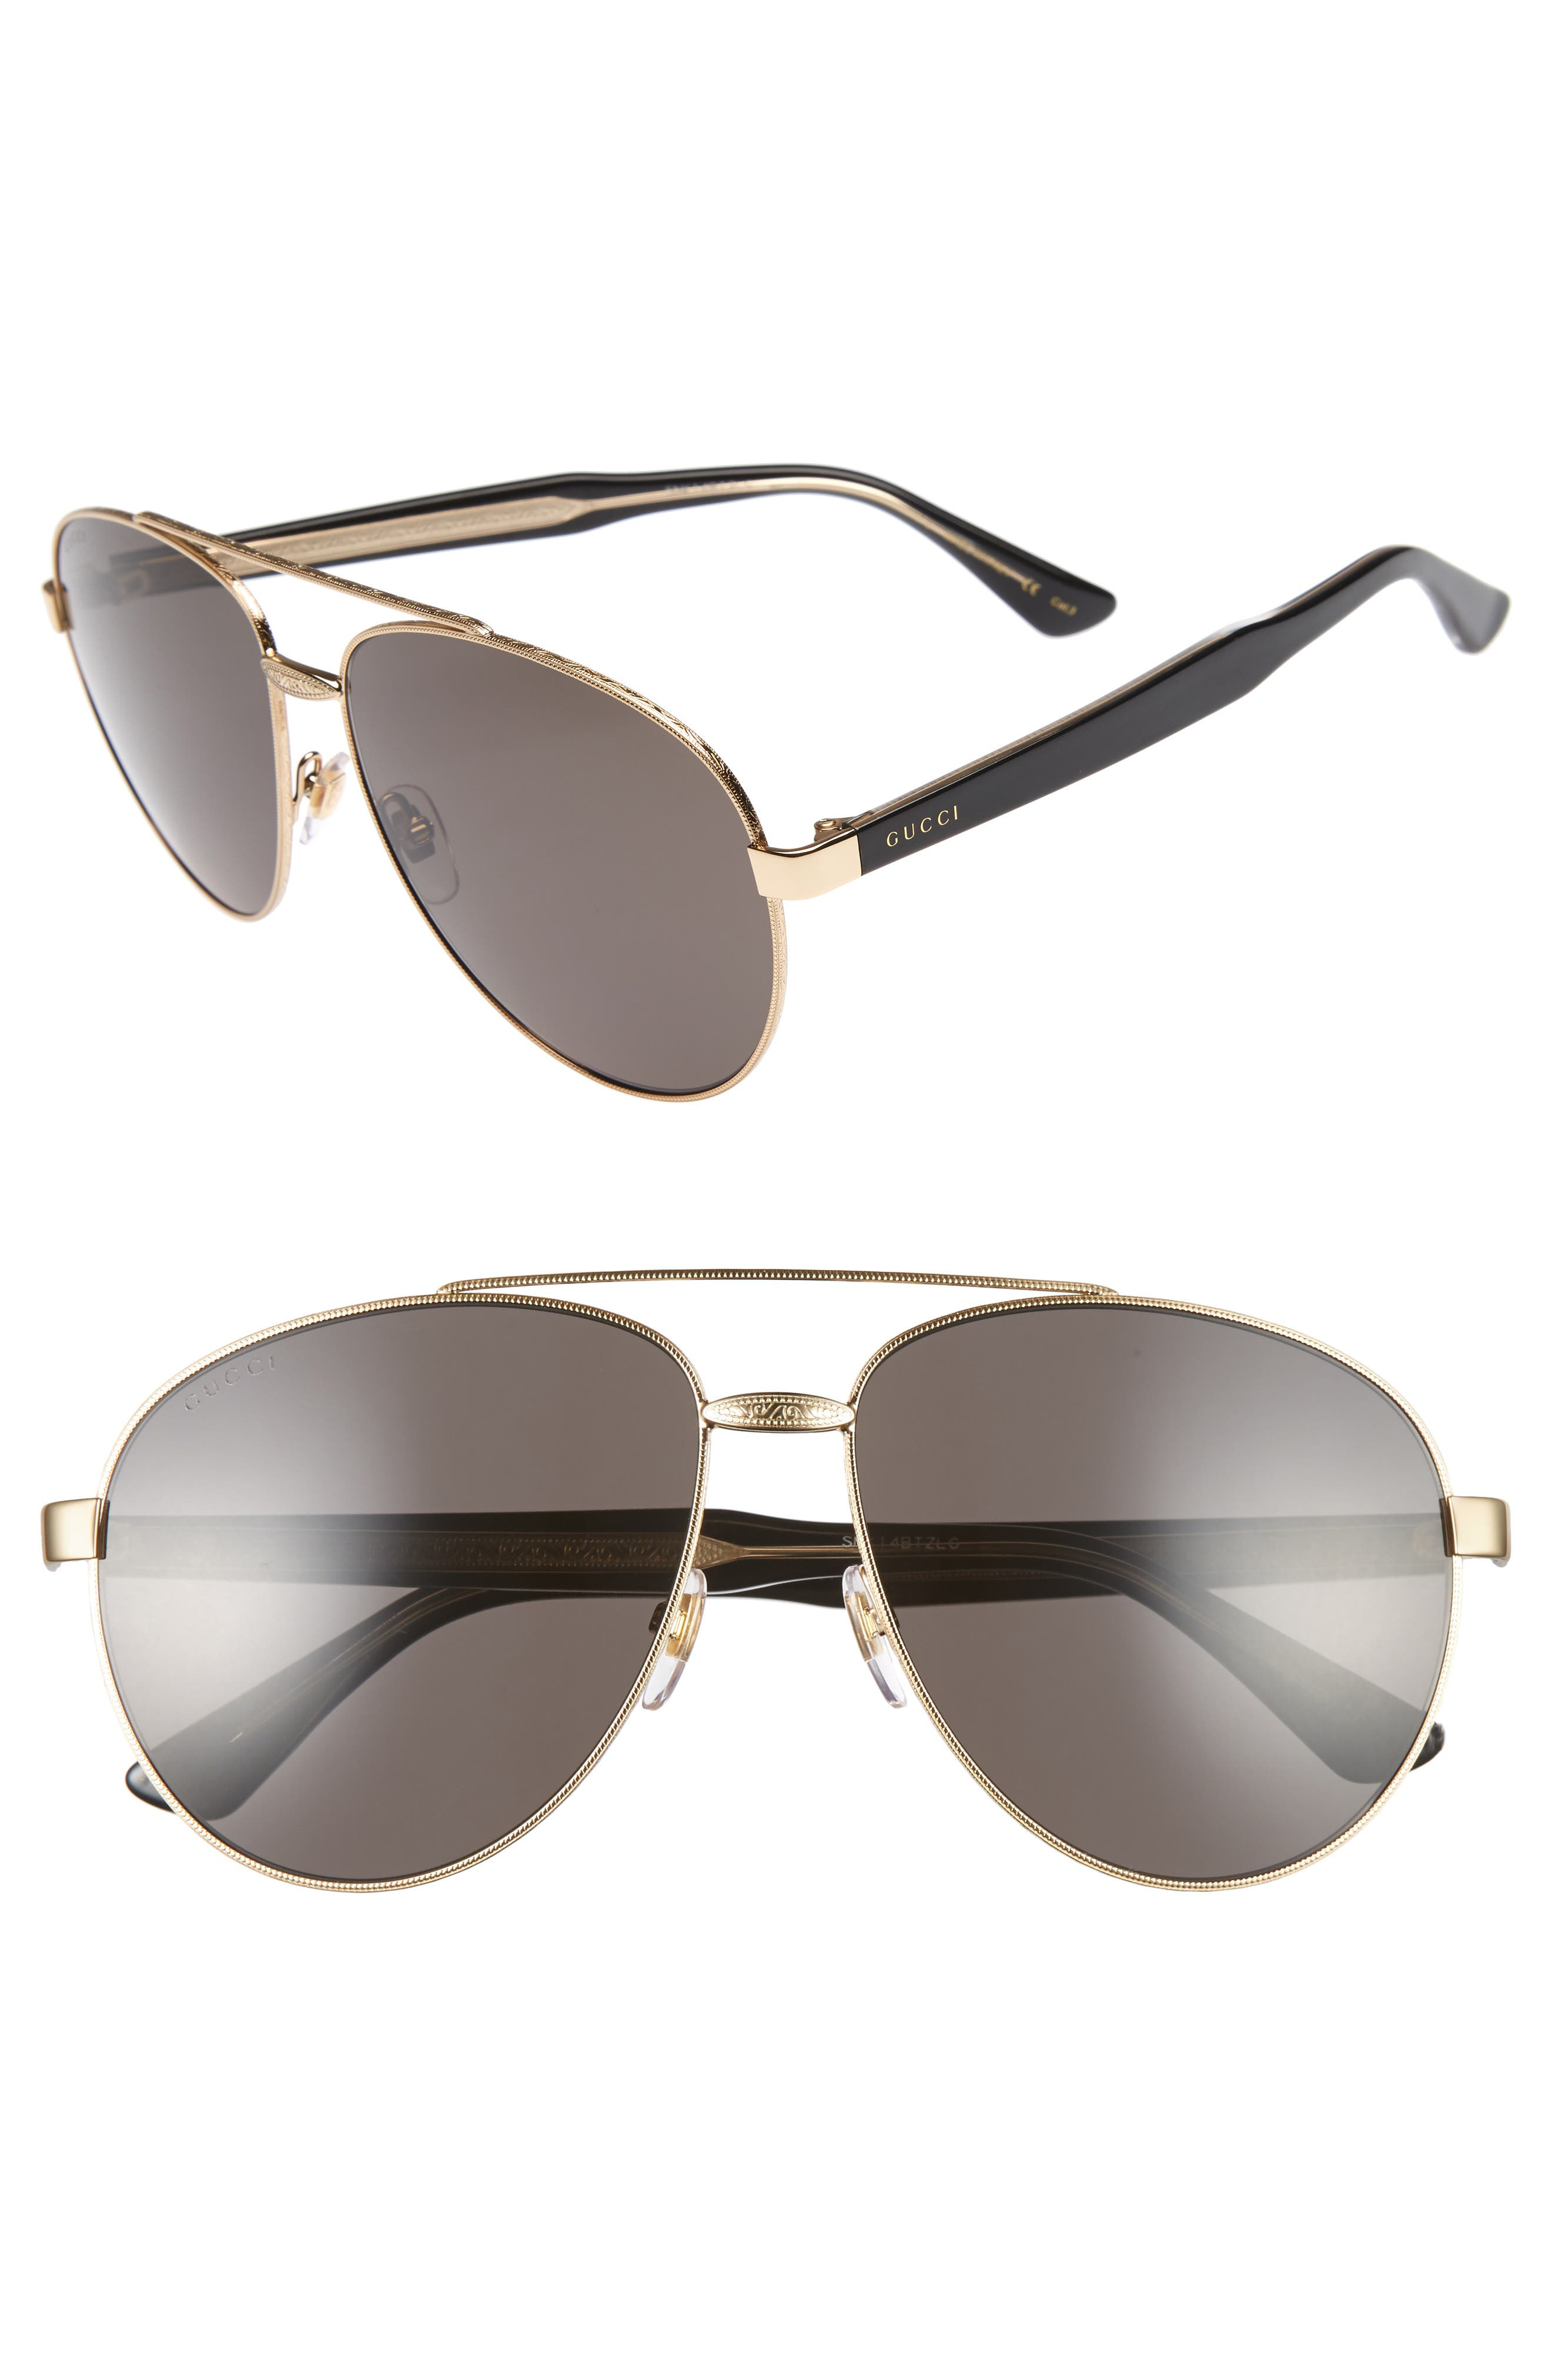 61mm Aviator Sunglasses,                             Main thumbnail 1, color,                             710